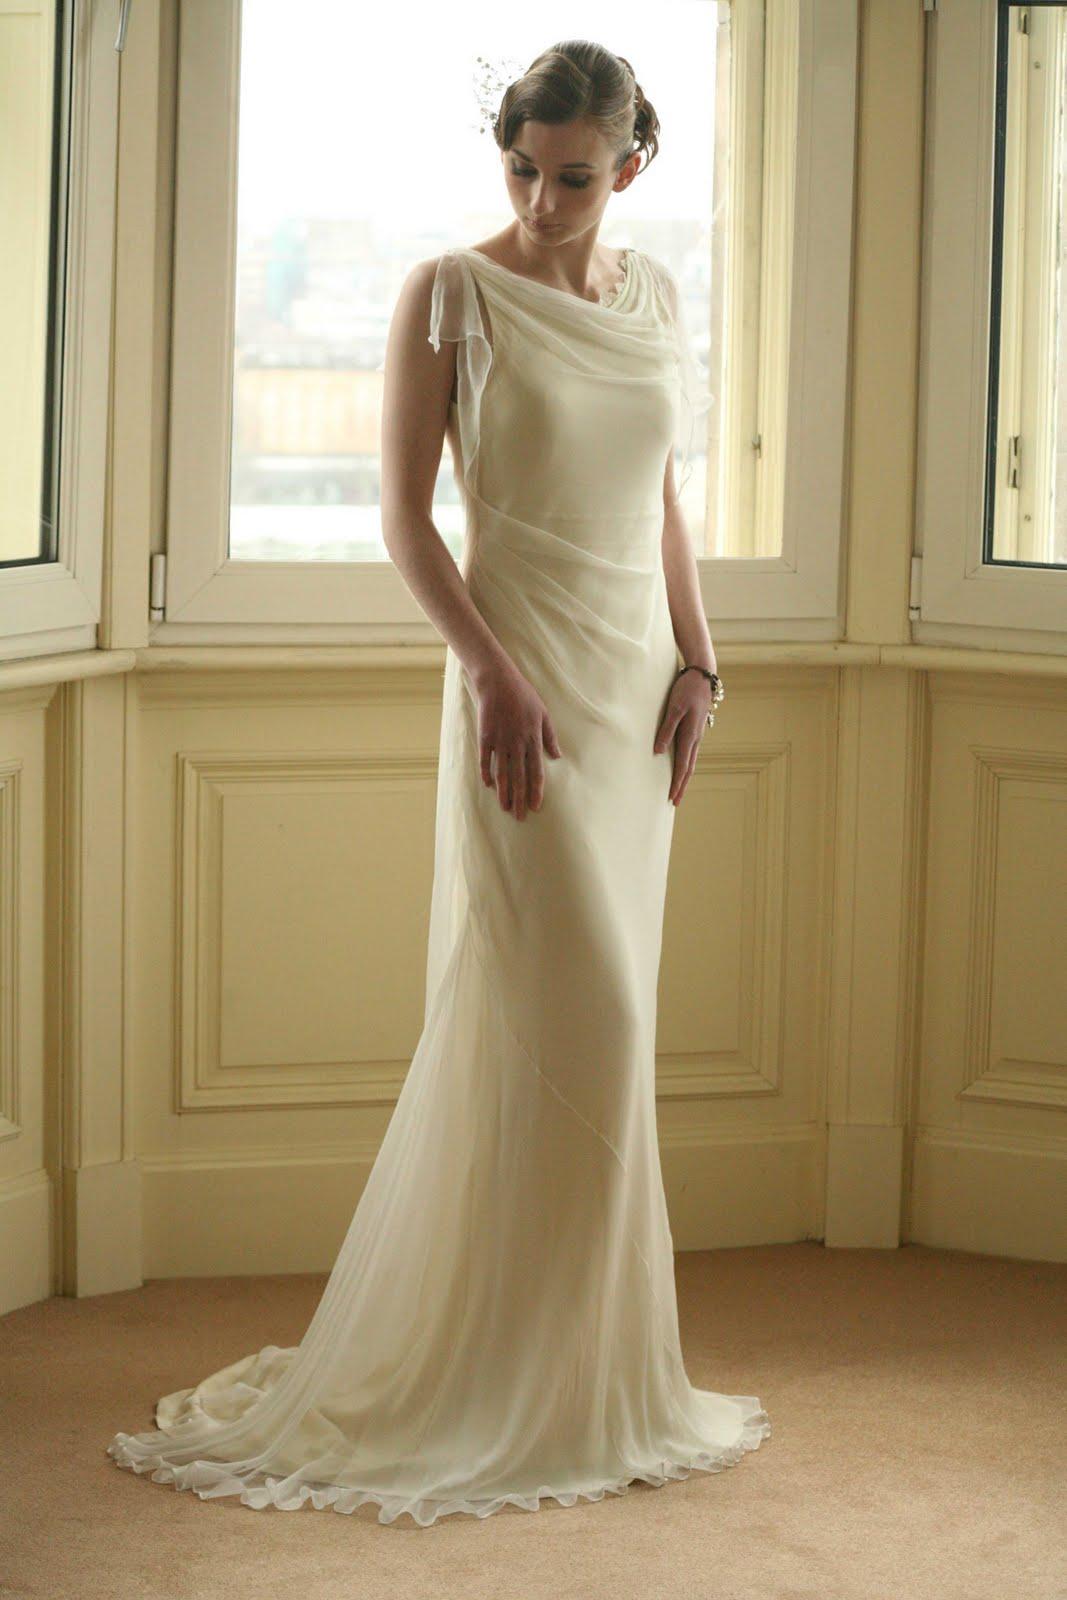 courthouse wedding dress plus size courthouse wedding dresses Courthouse Wedding Dress Plus Size